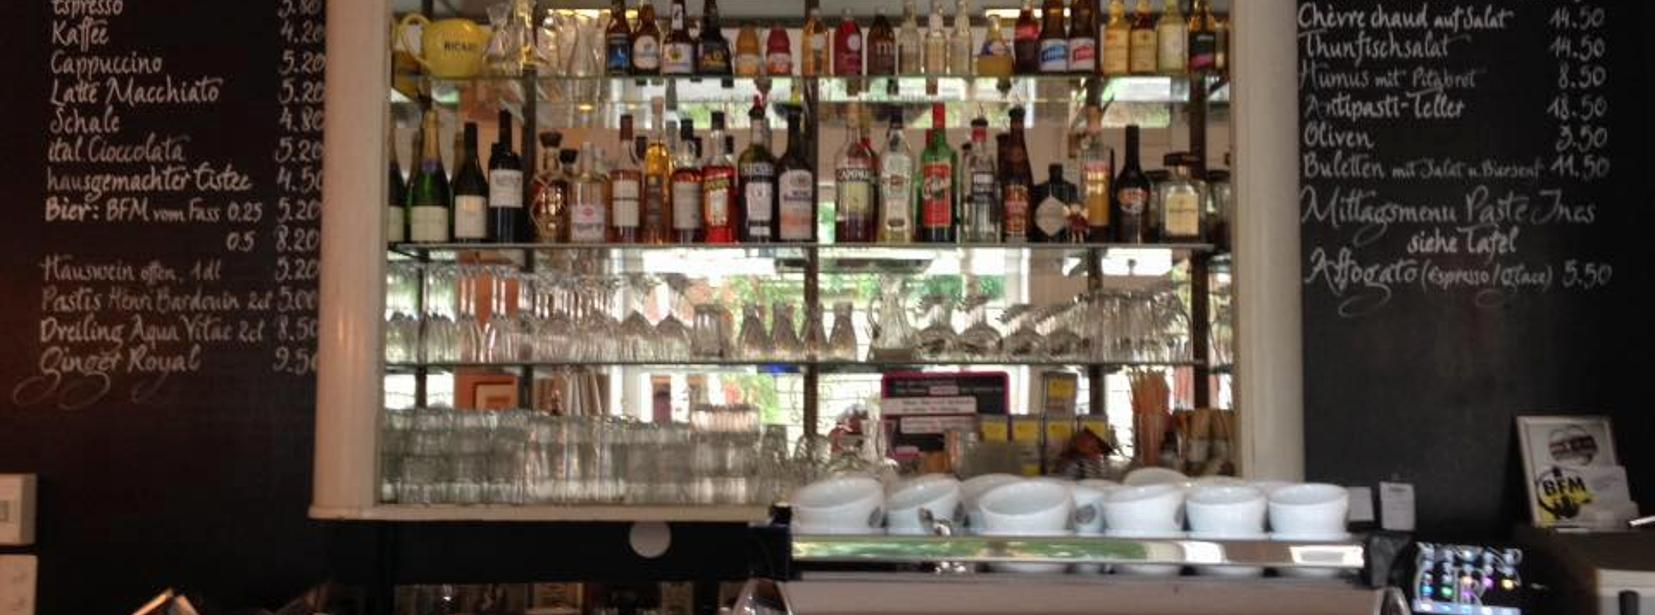 Café Bar Rosenkranz | Basel | MyCityHighlight